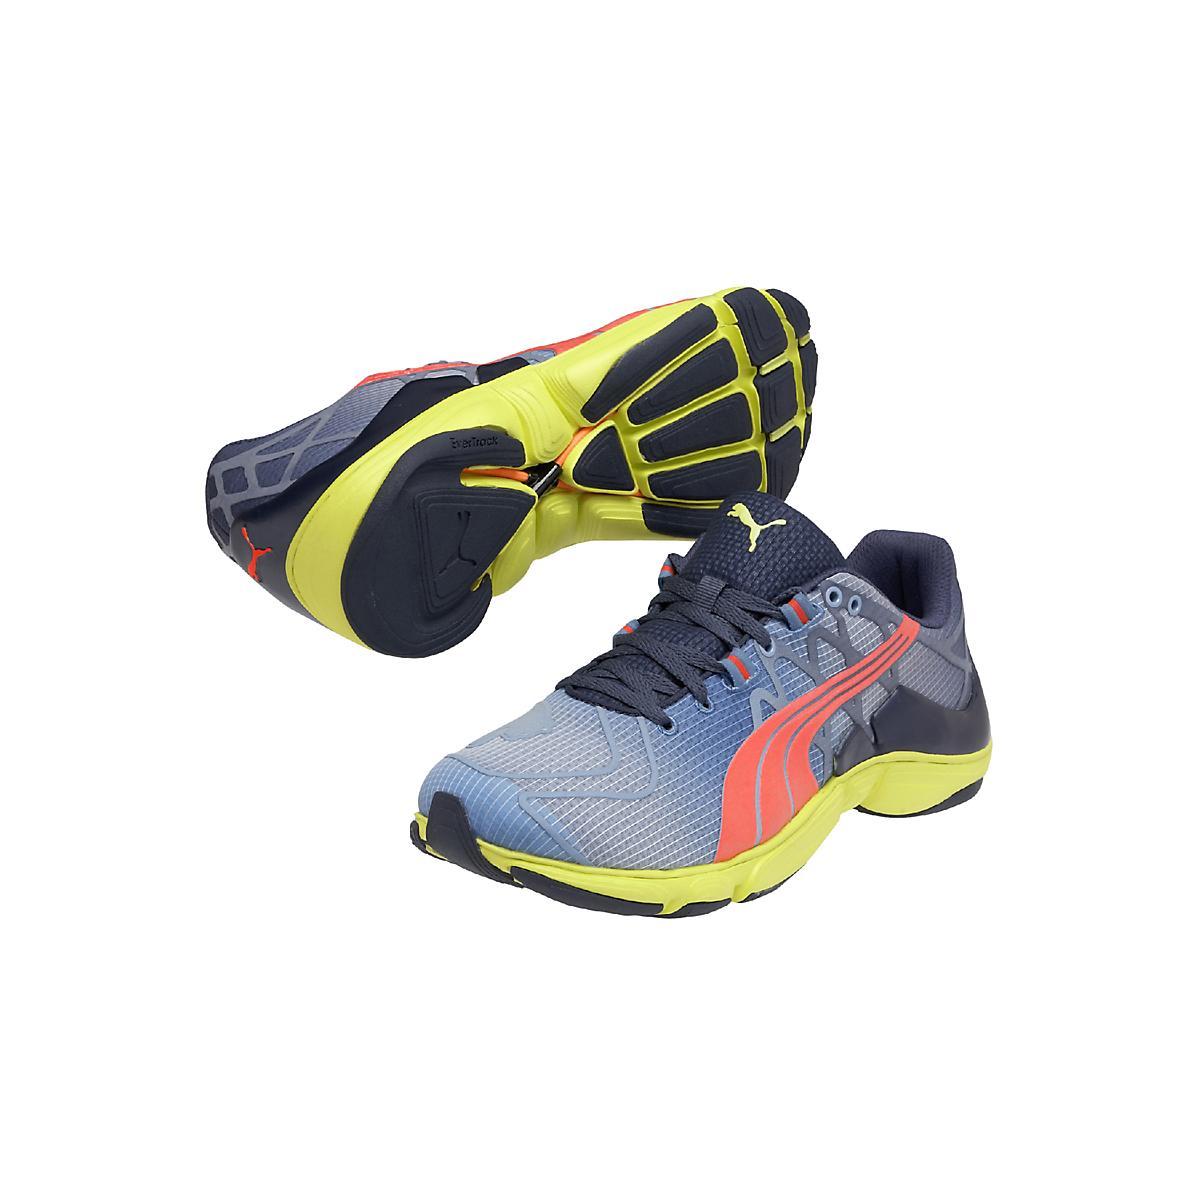 Mens Puma Mobium Elite v2 Running Shoe at Road Runner Sports e43833c0e